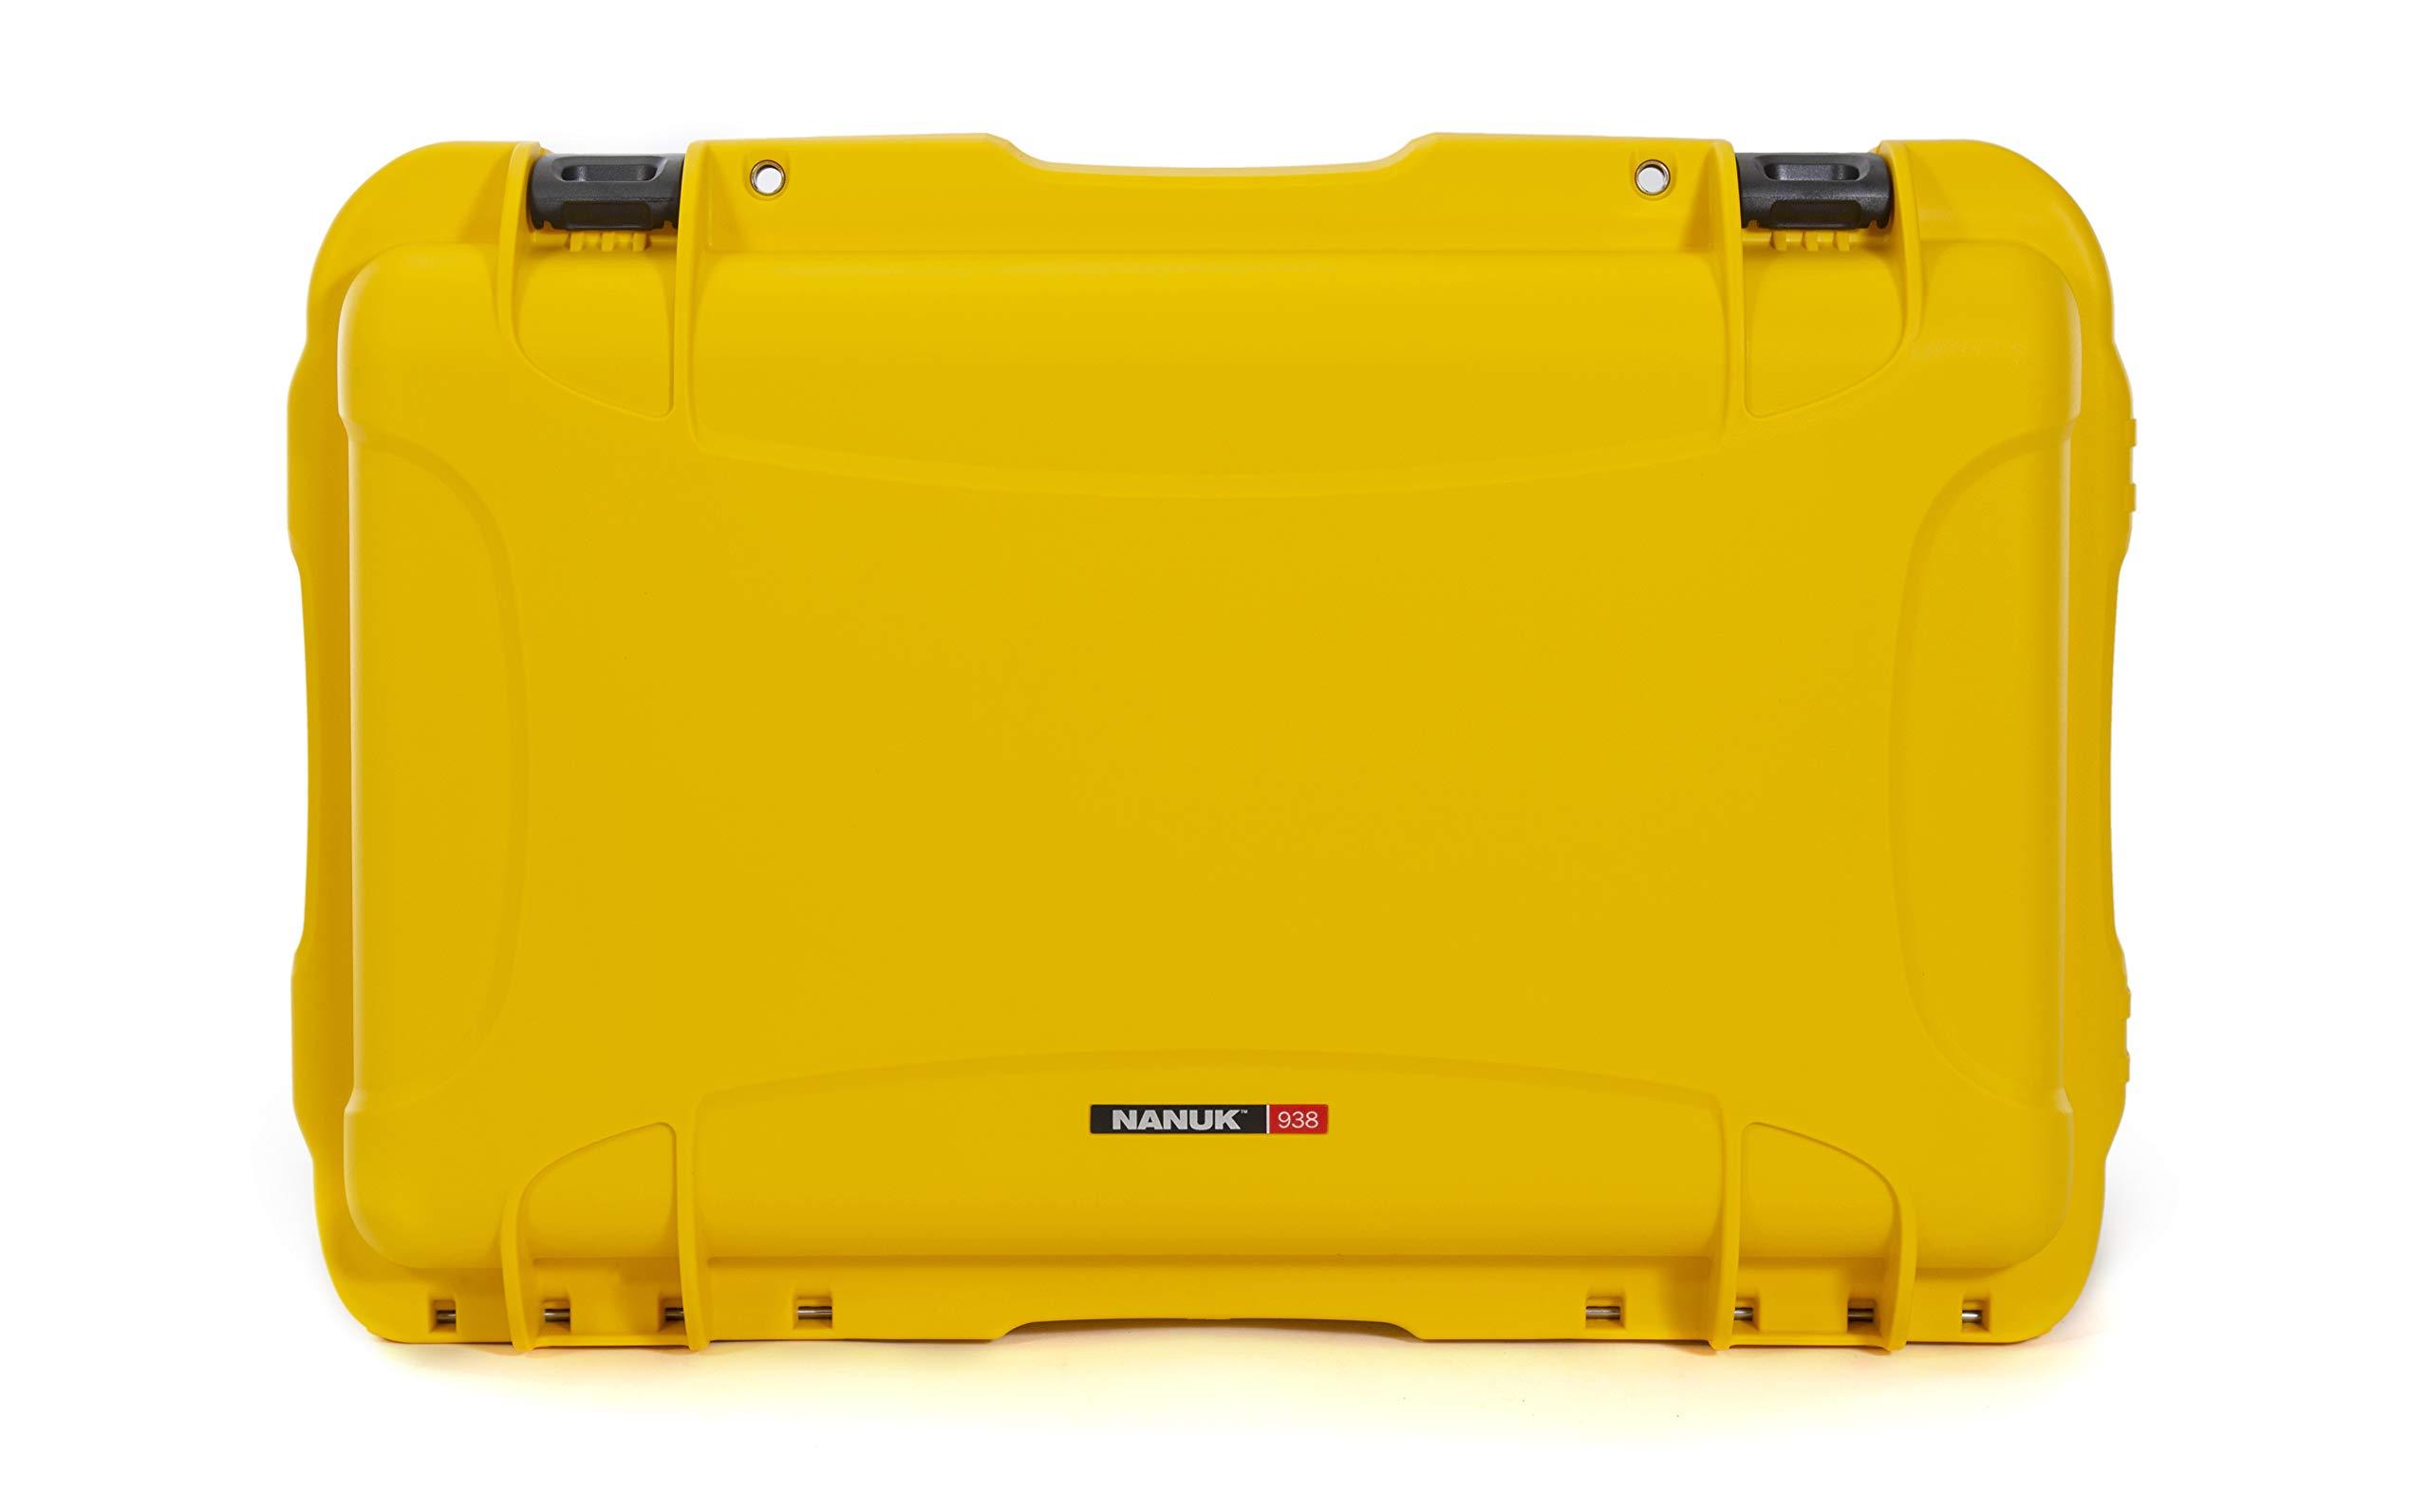 Nanuk 938 Waterproof Hard Case with Wheels and Foam Insert - Yellow by Nanuk